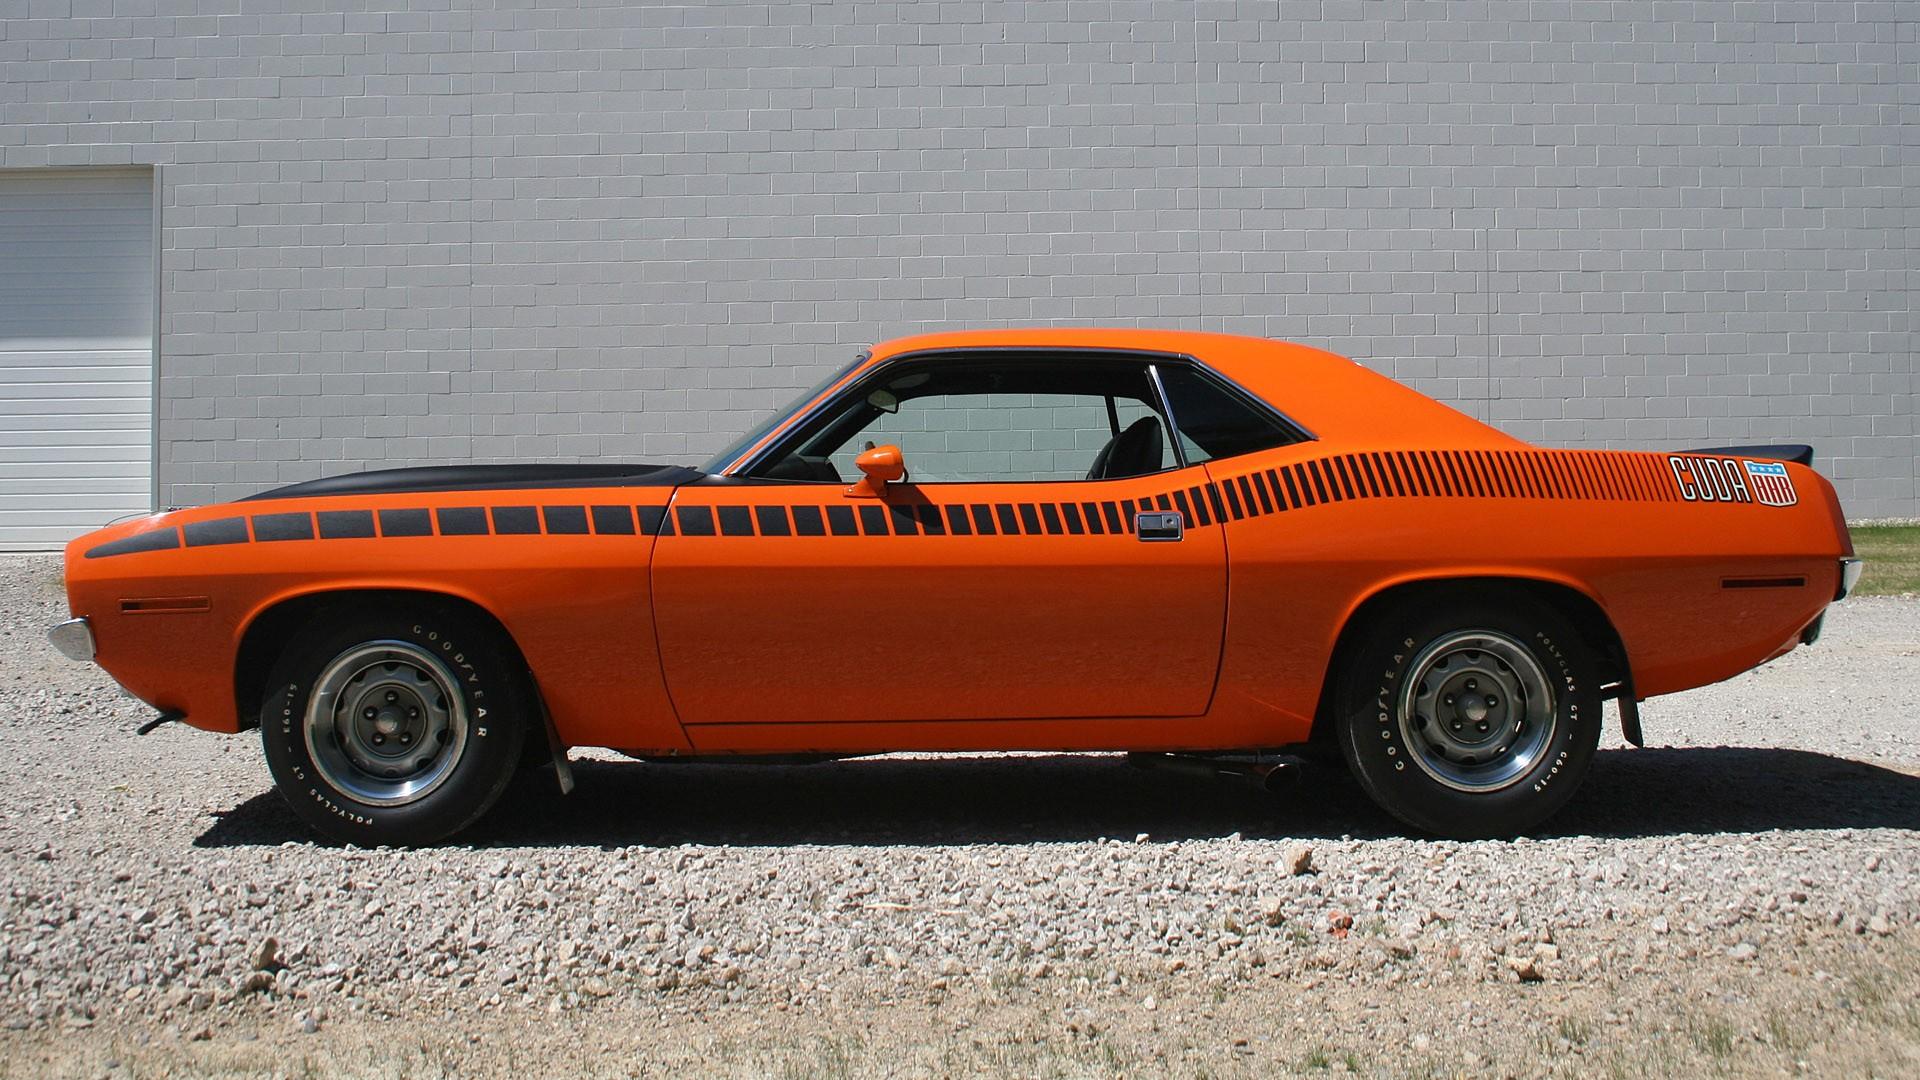 Free Photo Orange Classic Car Rim Retro Shiny Free Download